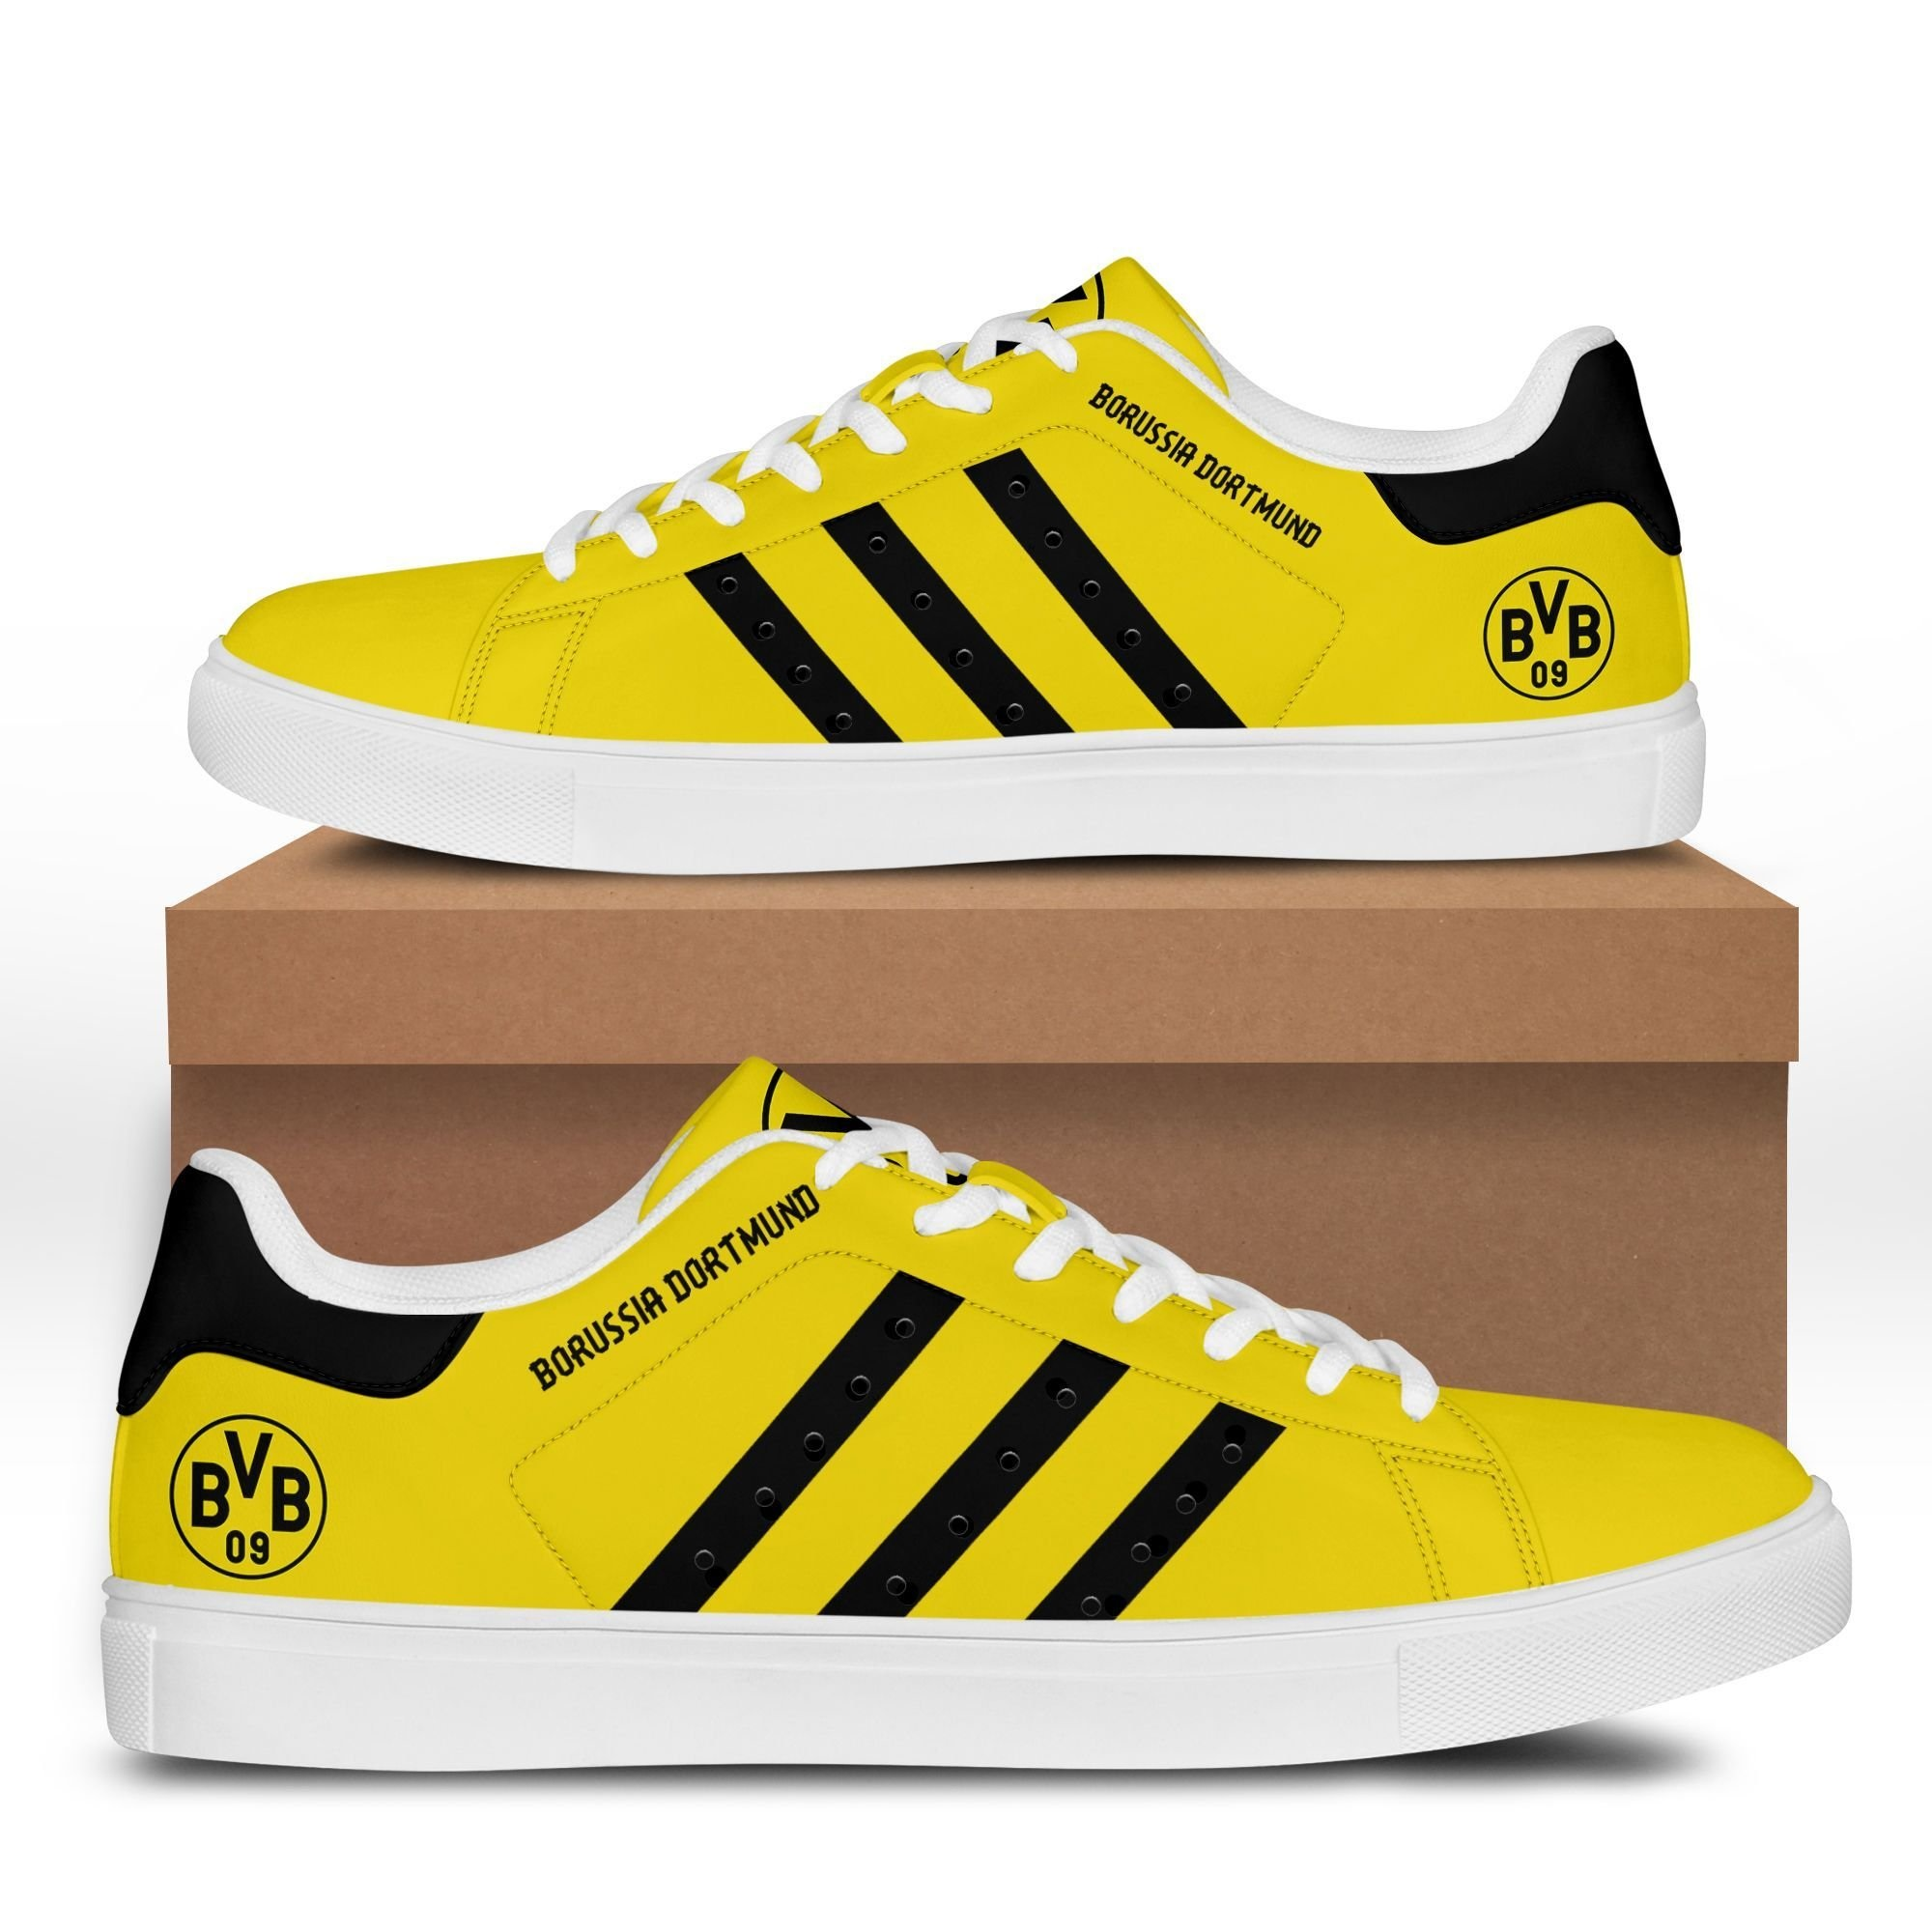 Dortmund stan smith shoes